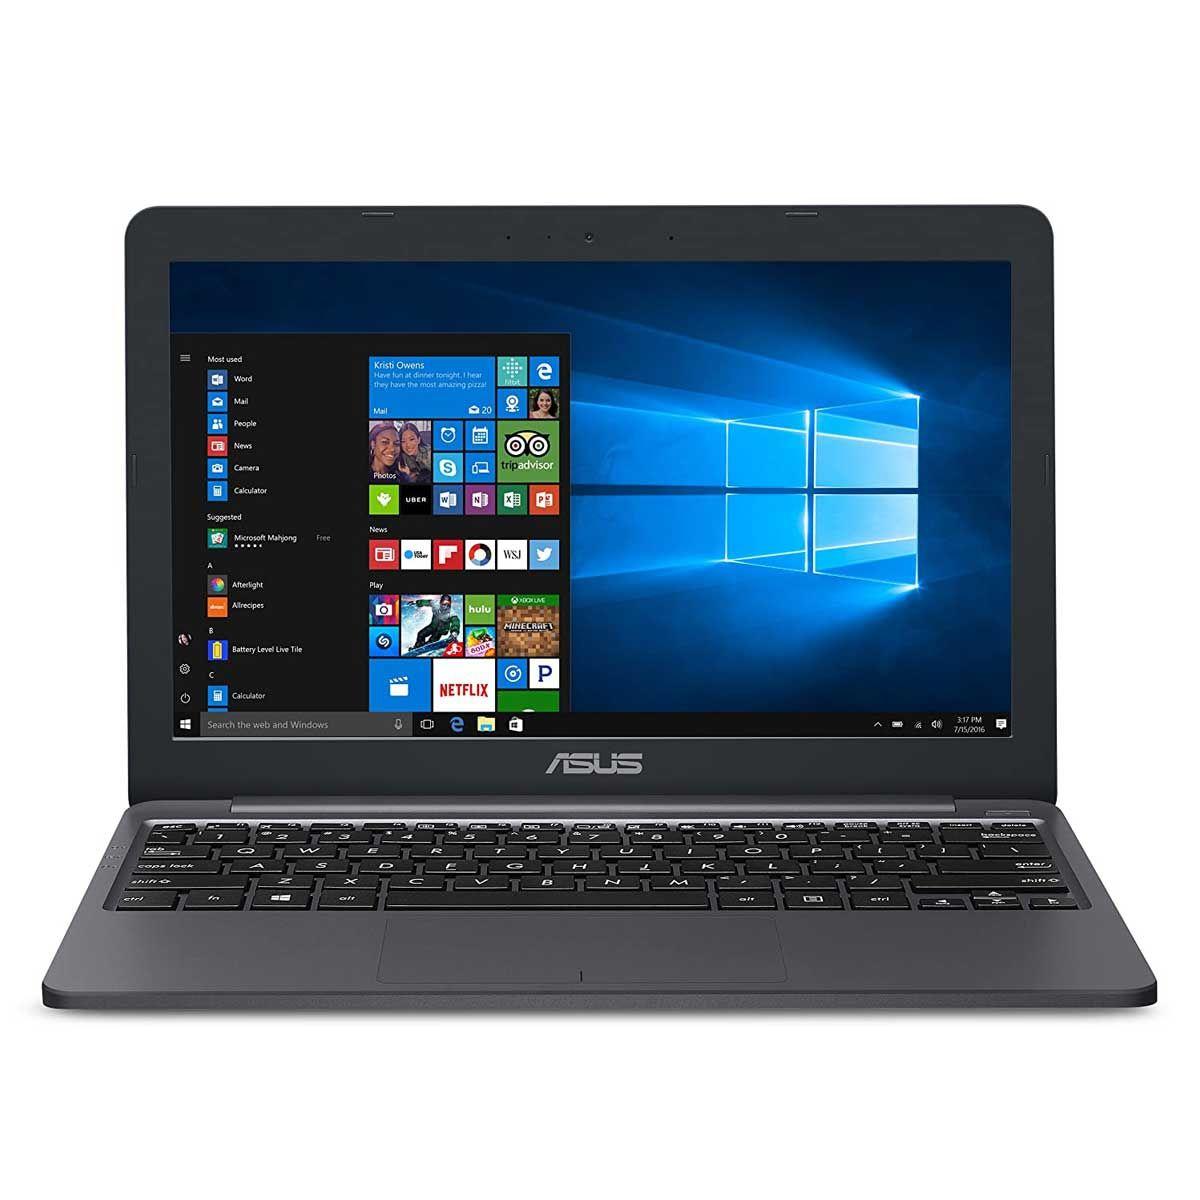 ASUS VivoBook (E203MA-YS03)